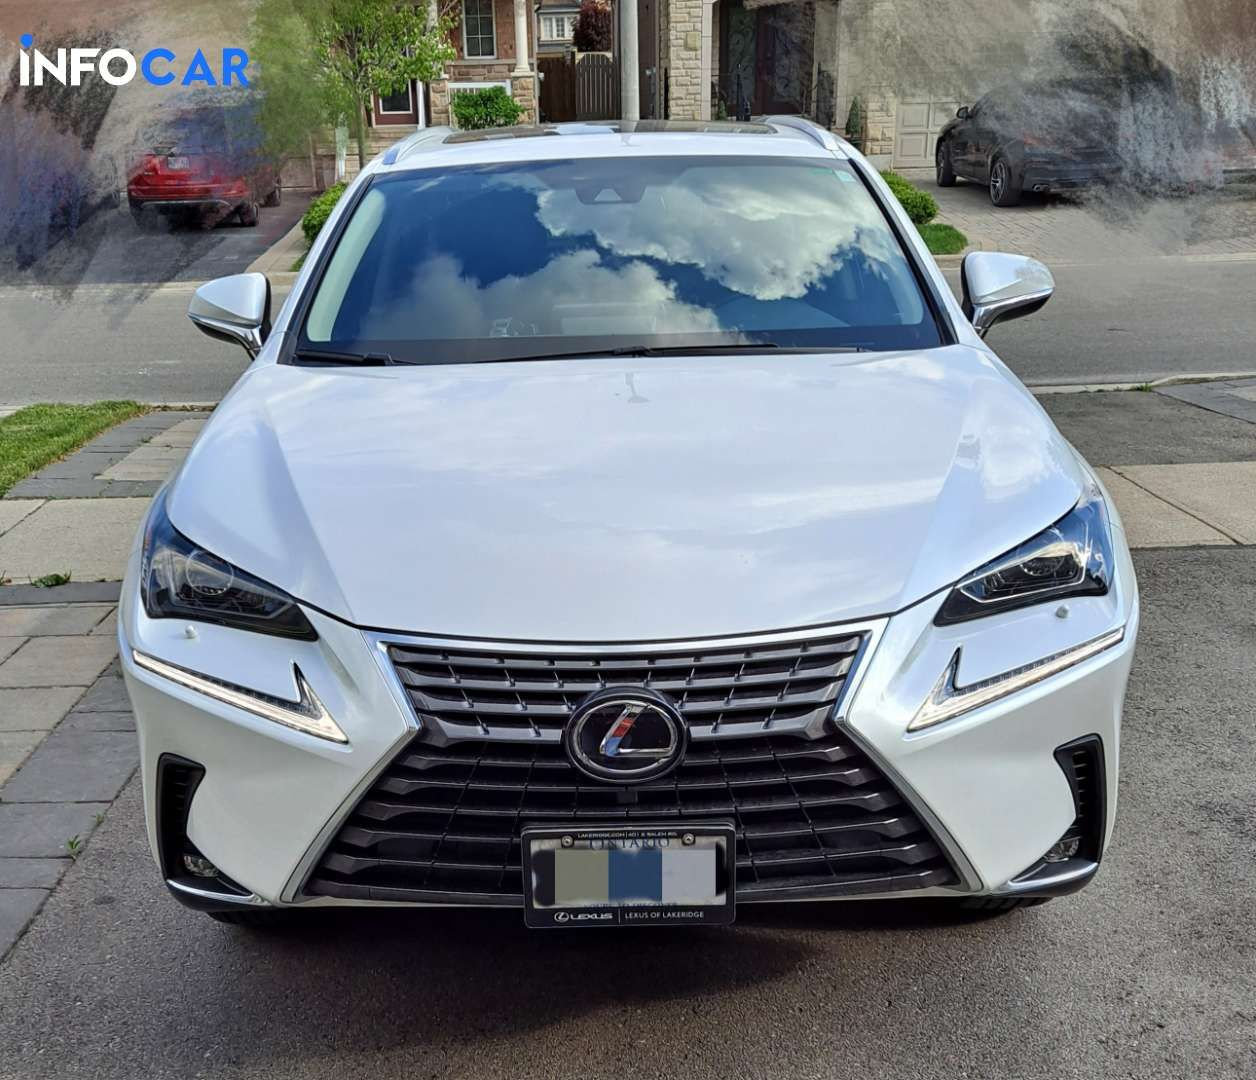 2021 Lexus NX 300 2021 Lexus Auto B - INFOCAR - Toronto's Most Comprehensive New and Used Auto Trading Platform